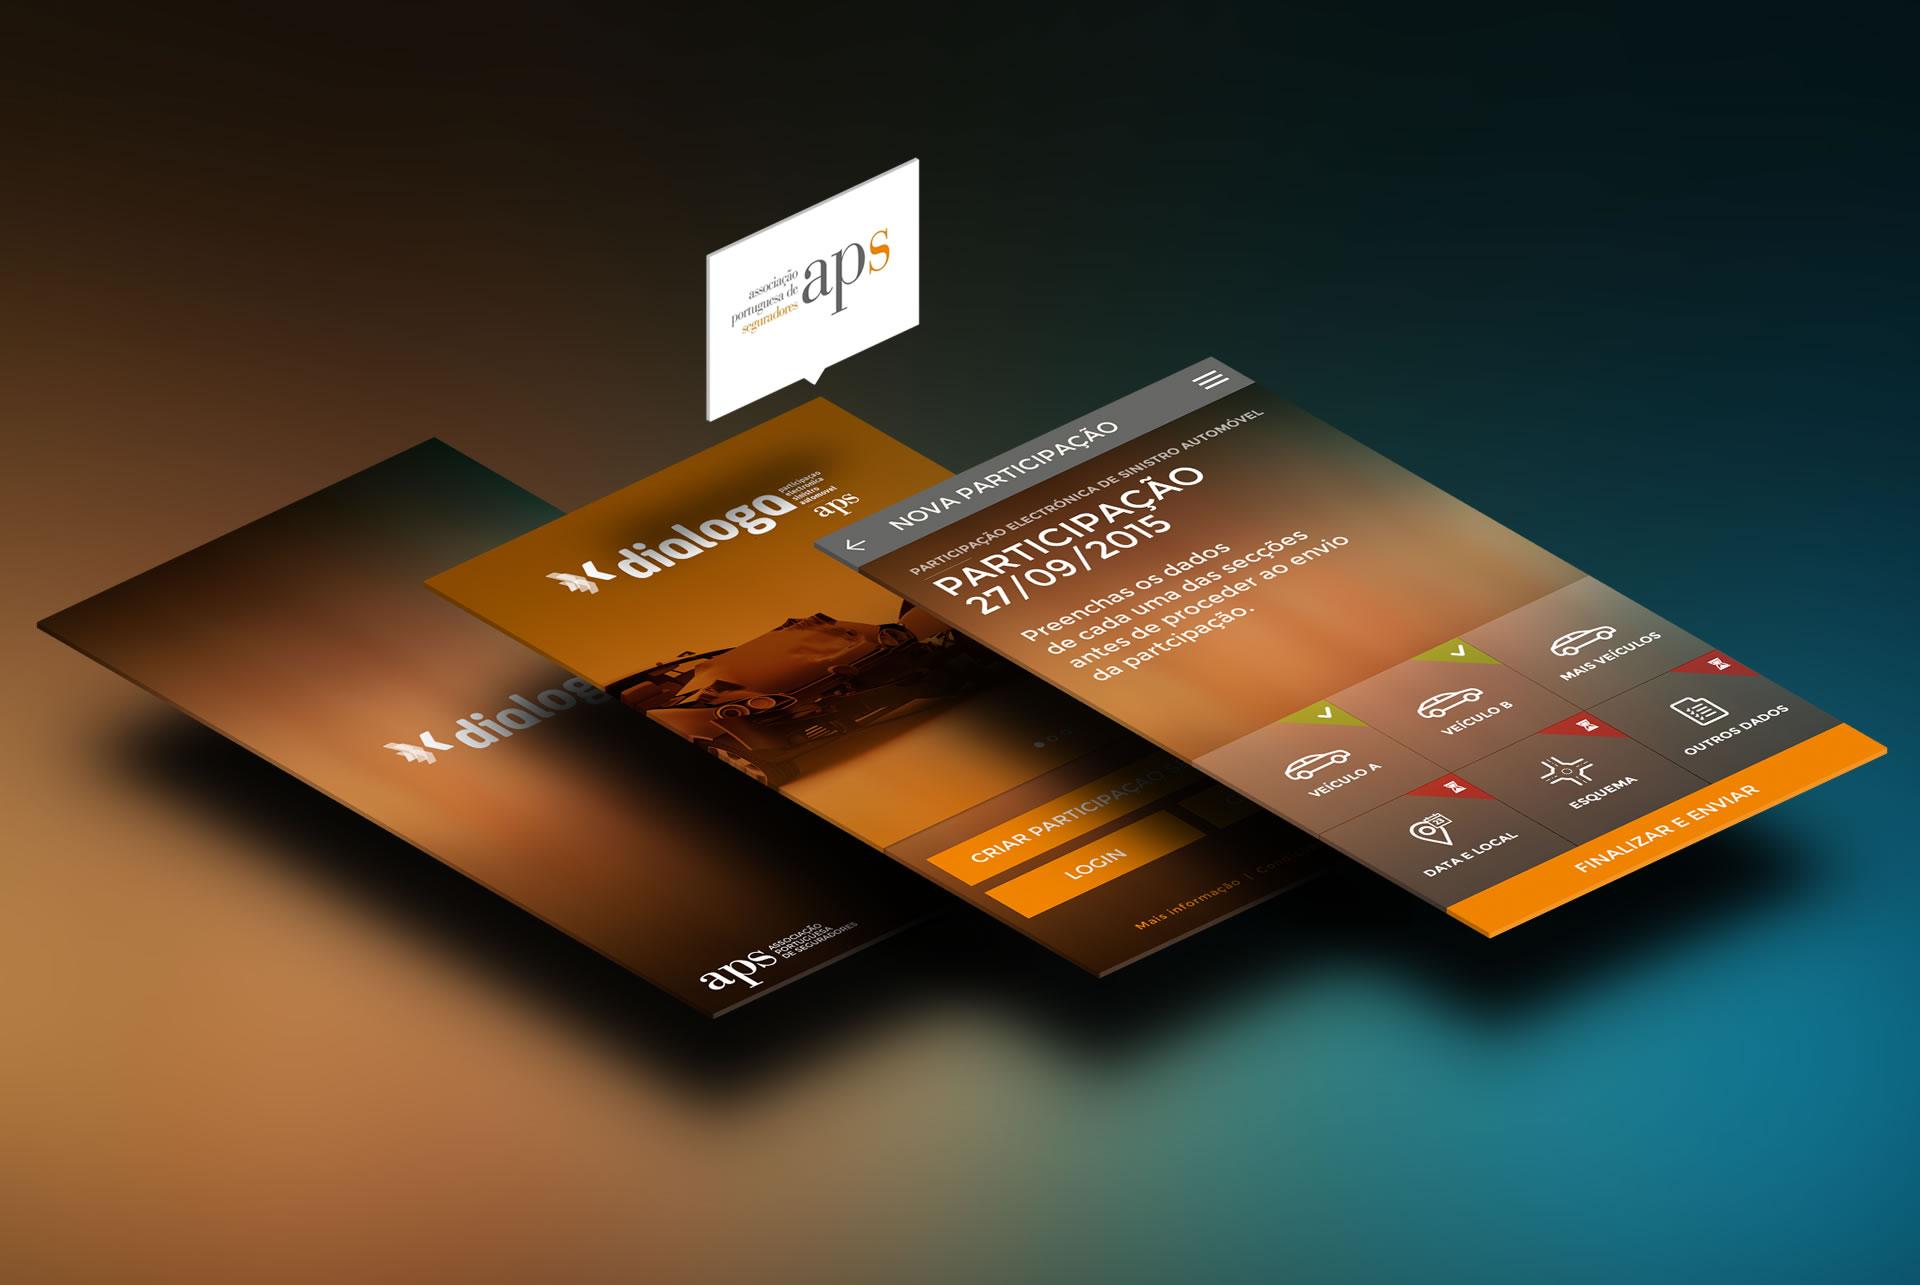 APS portugal. e-segurnet APP Mobile. Parte amistoso de accidentes